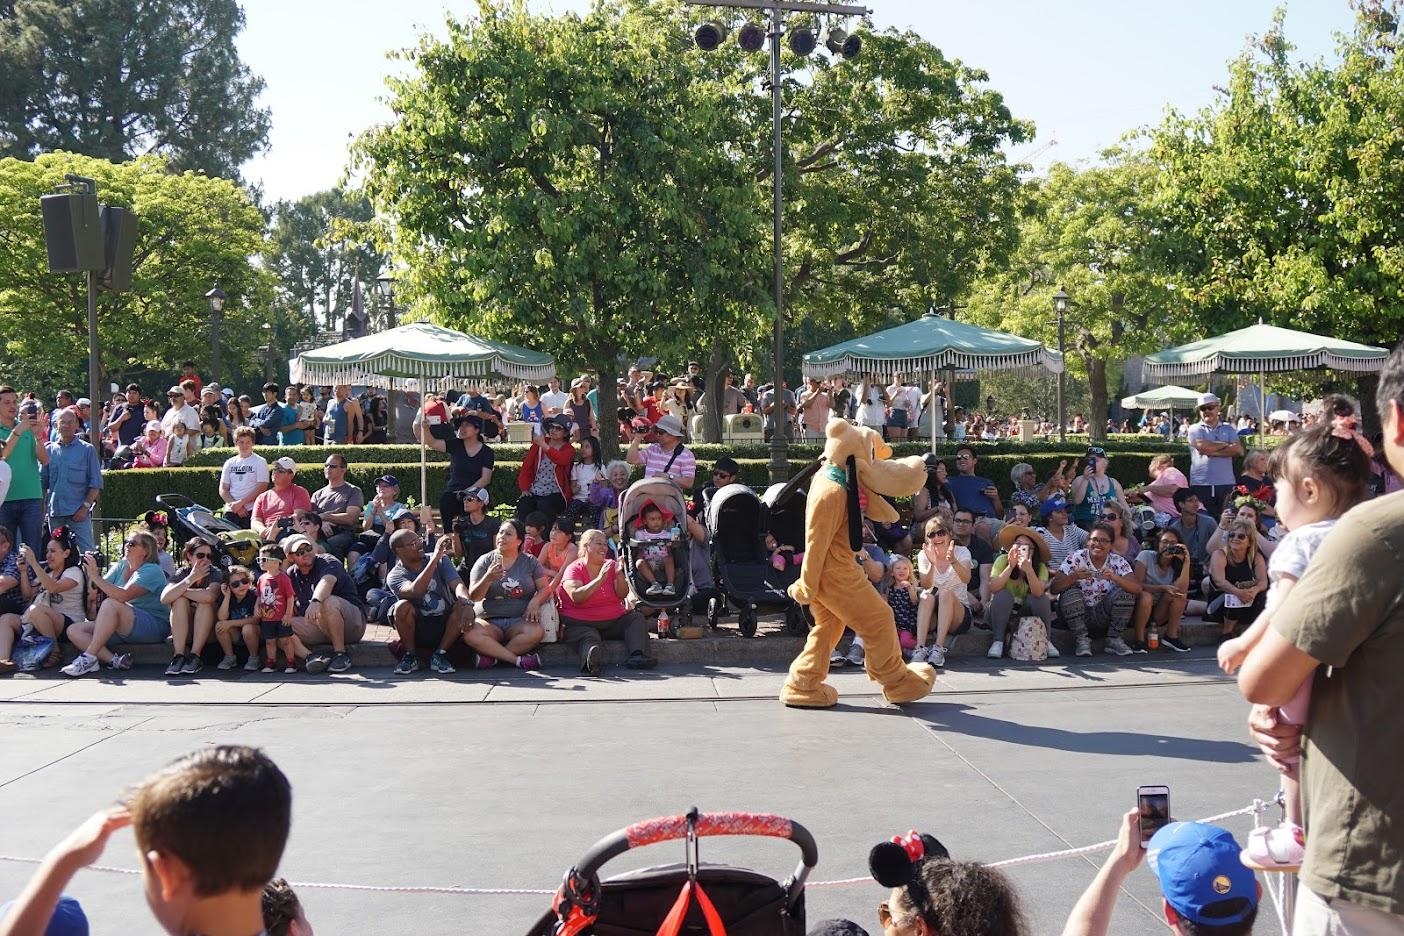 Pluto Disneyland